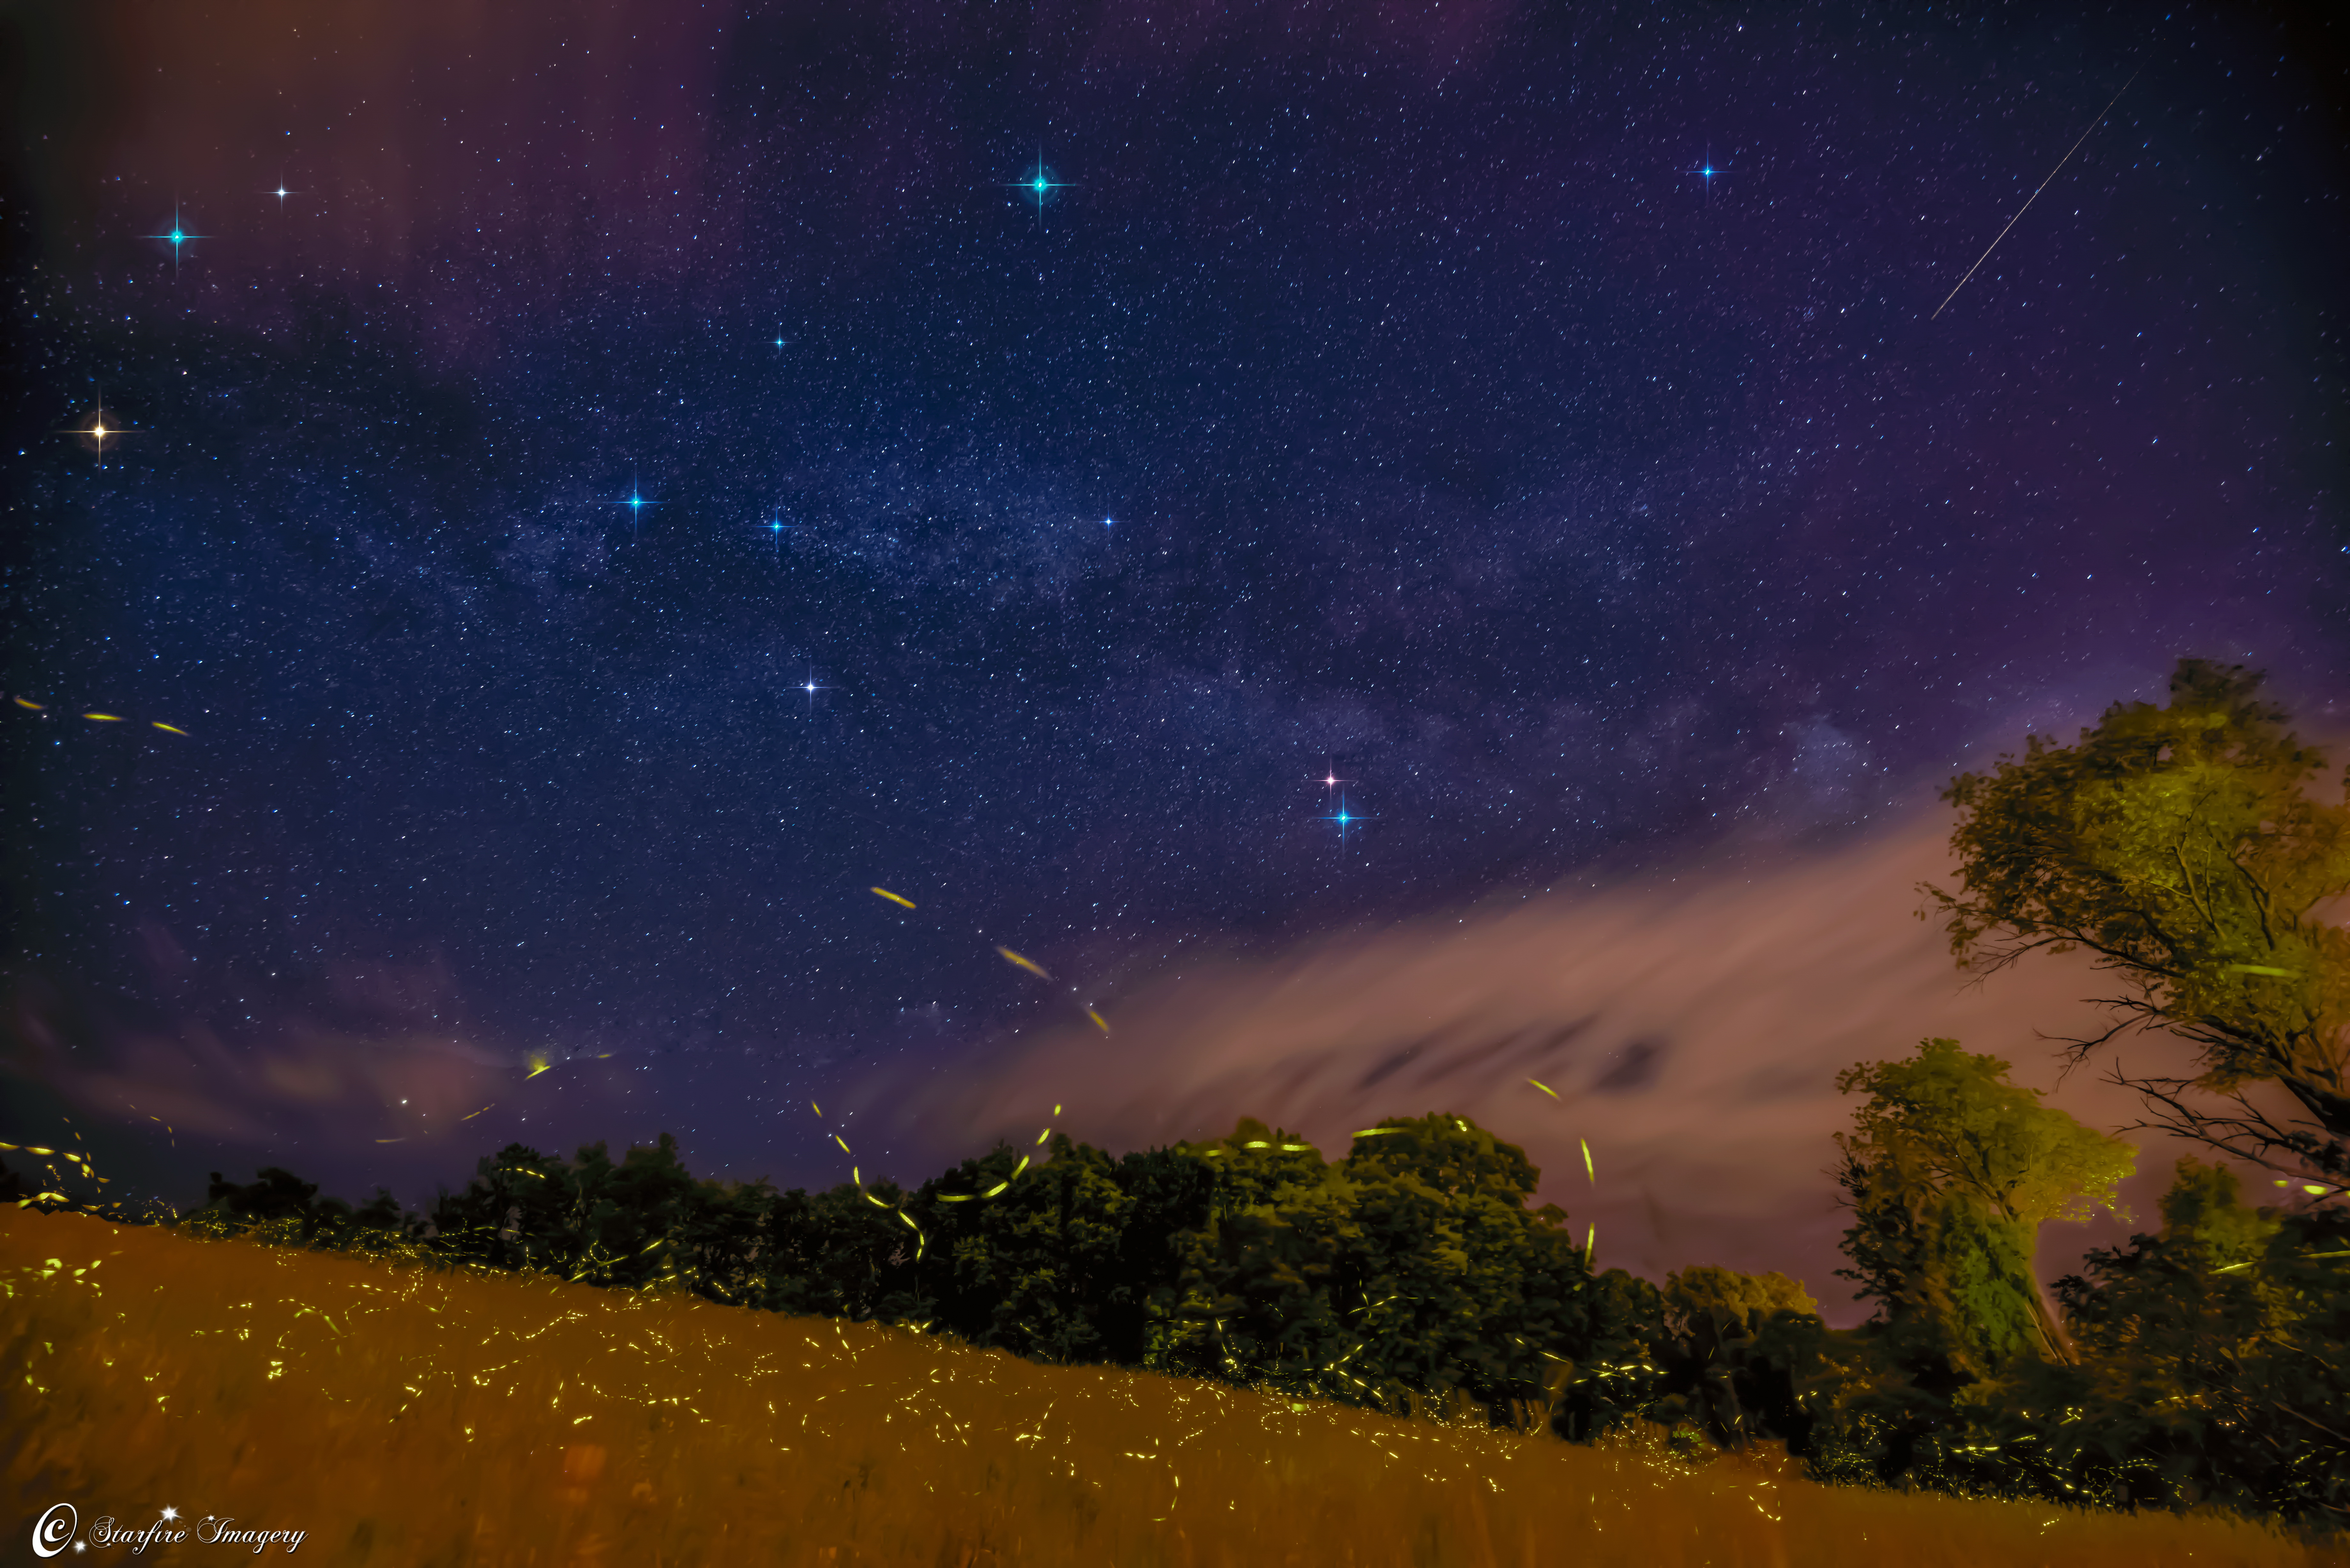 101 Best Night Sky Photos of 2014 by Stargazers